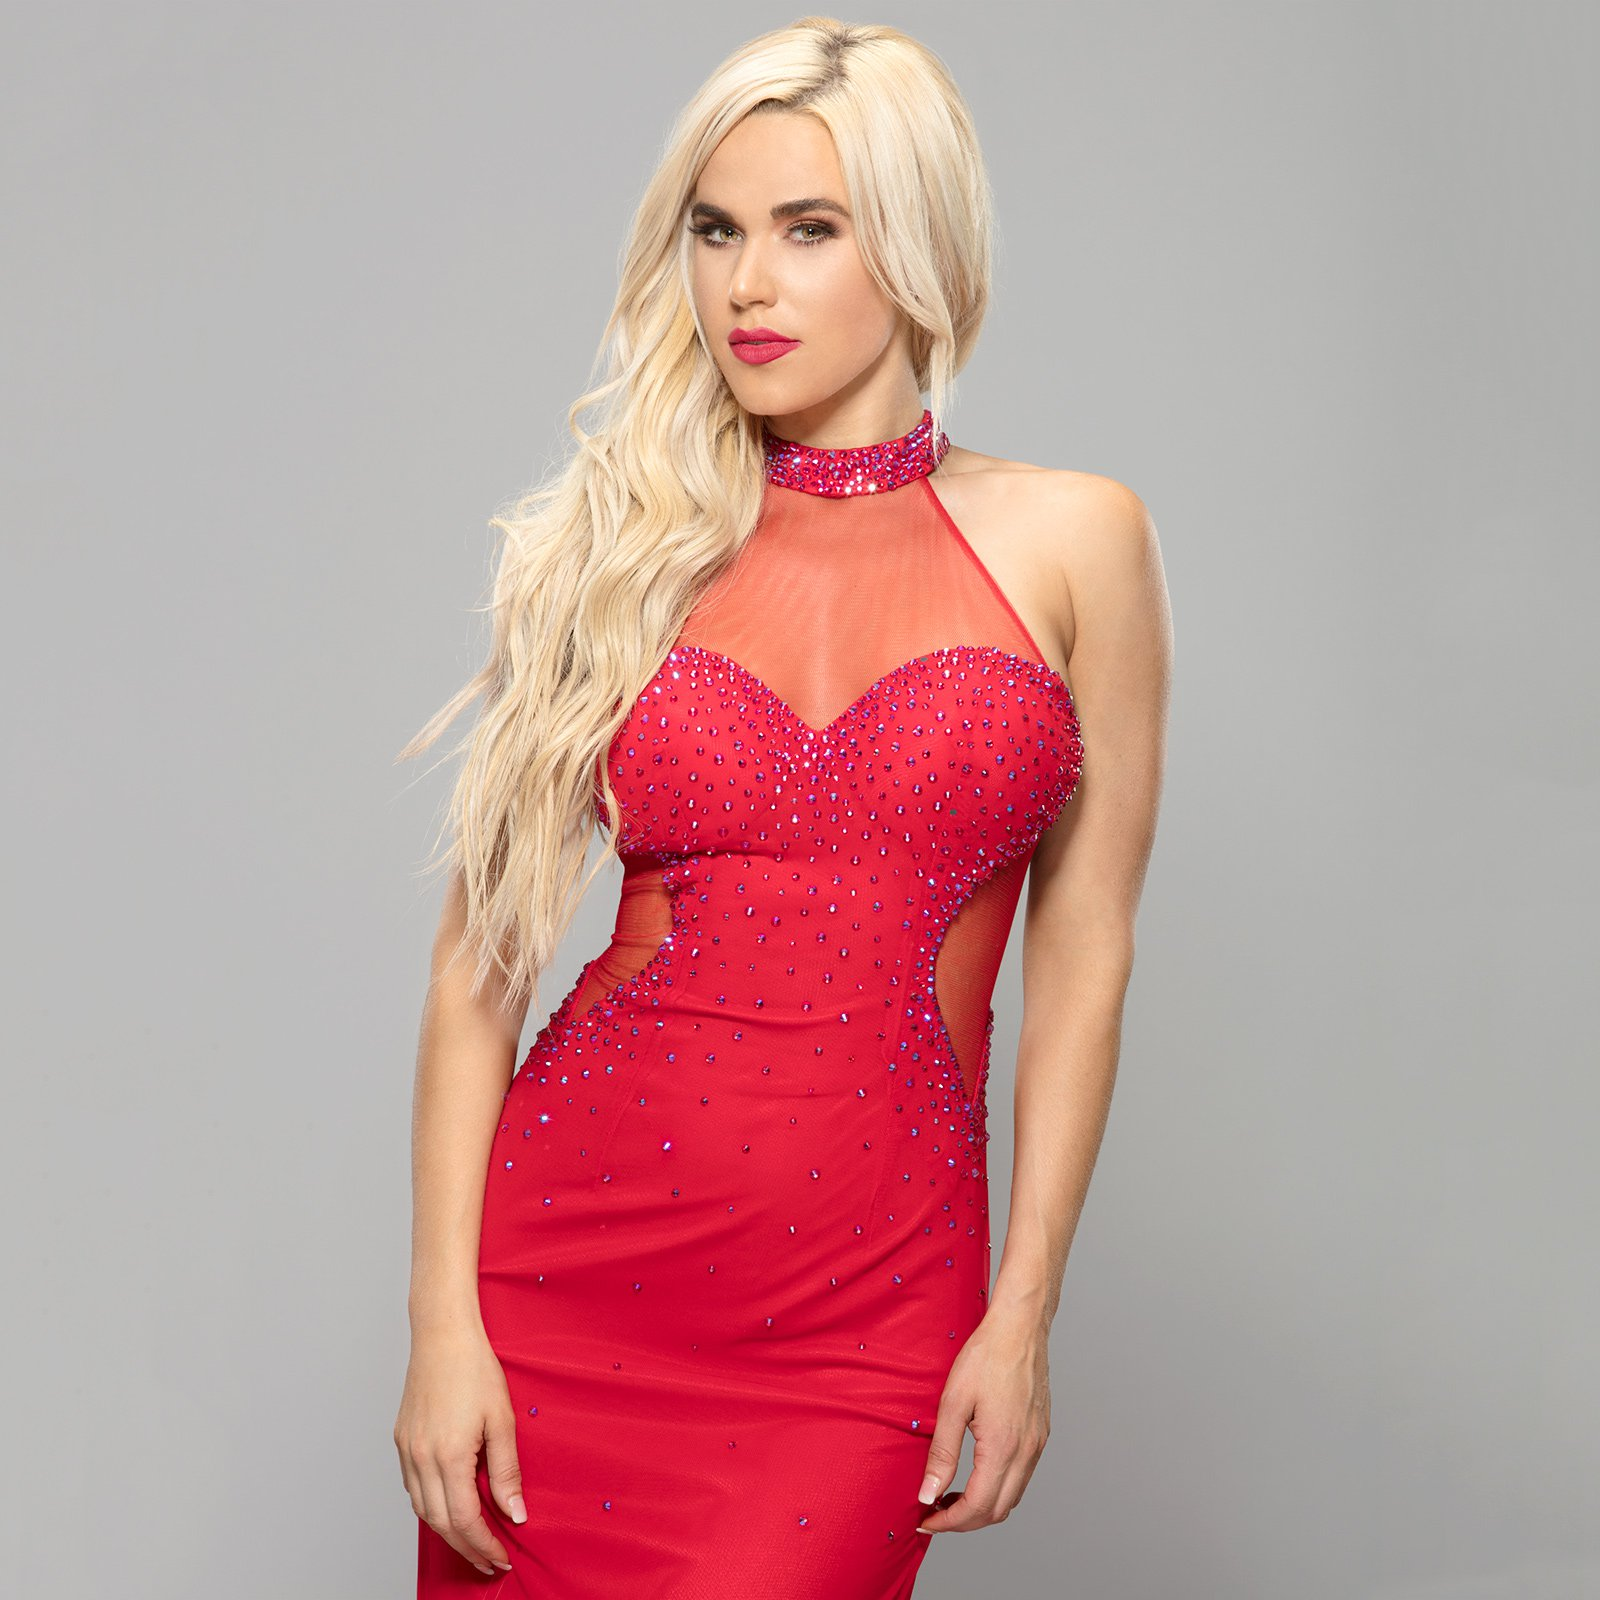 Lana WWE SmackDown Money in the Bank ladder match WWE